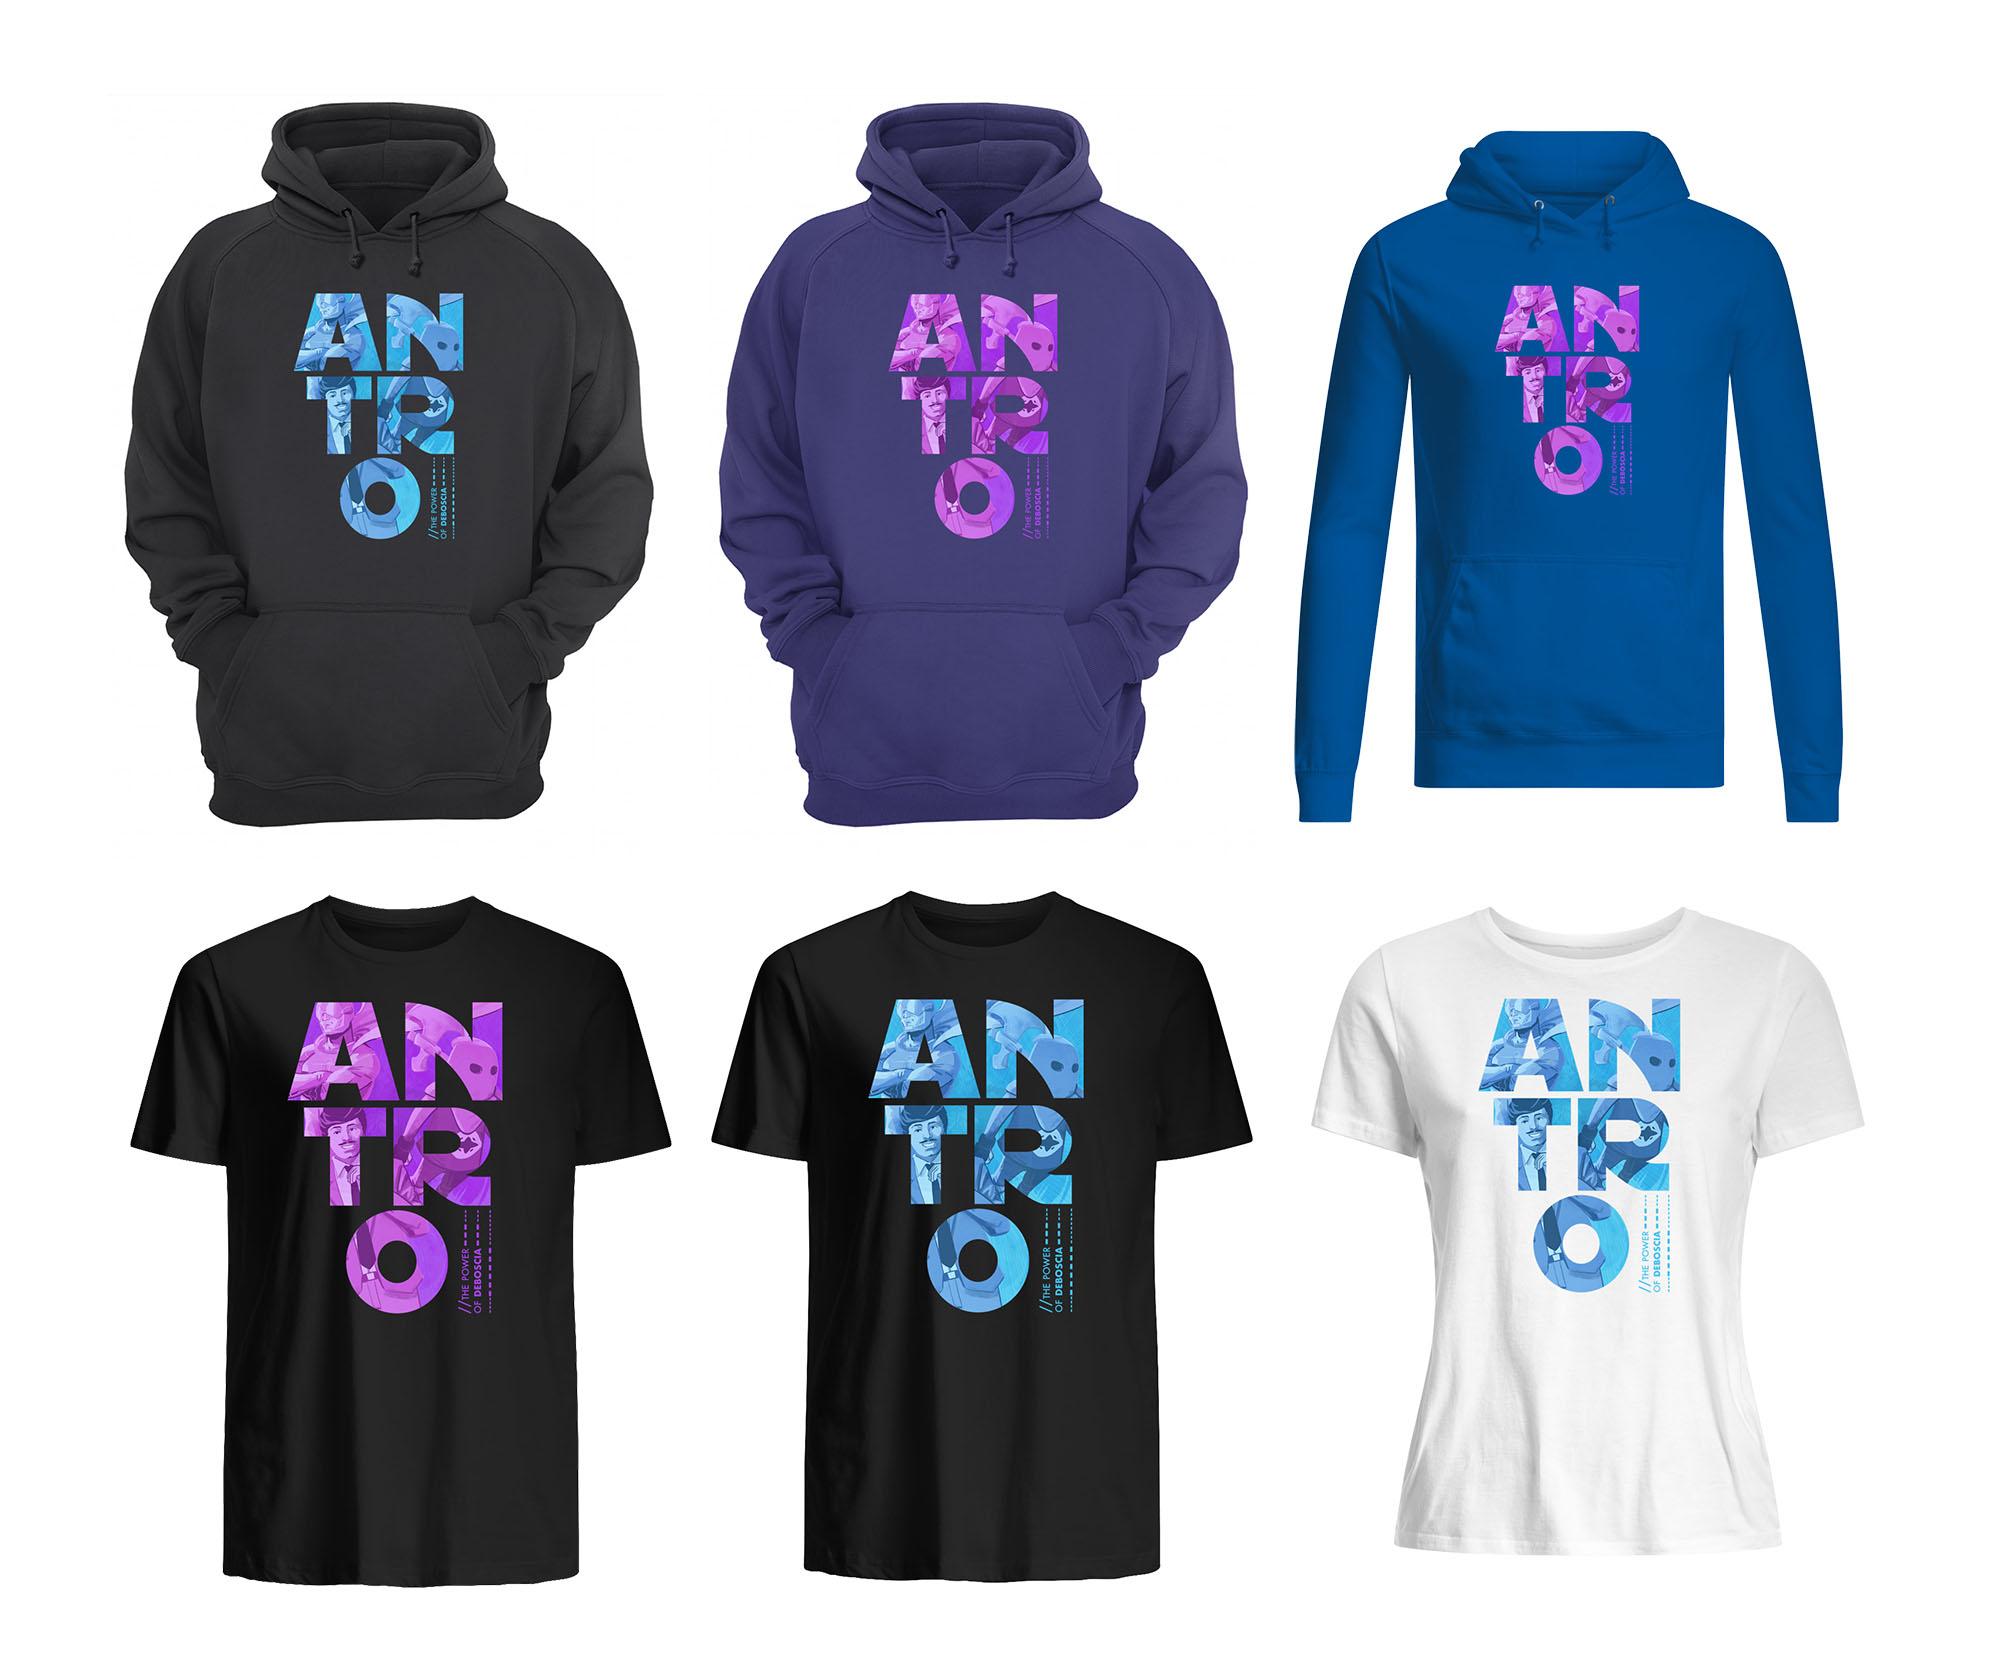 Antro Felpe t-shirt